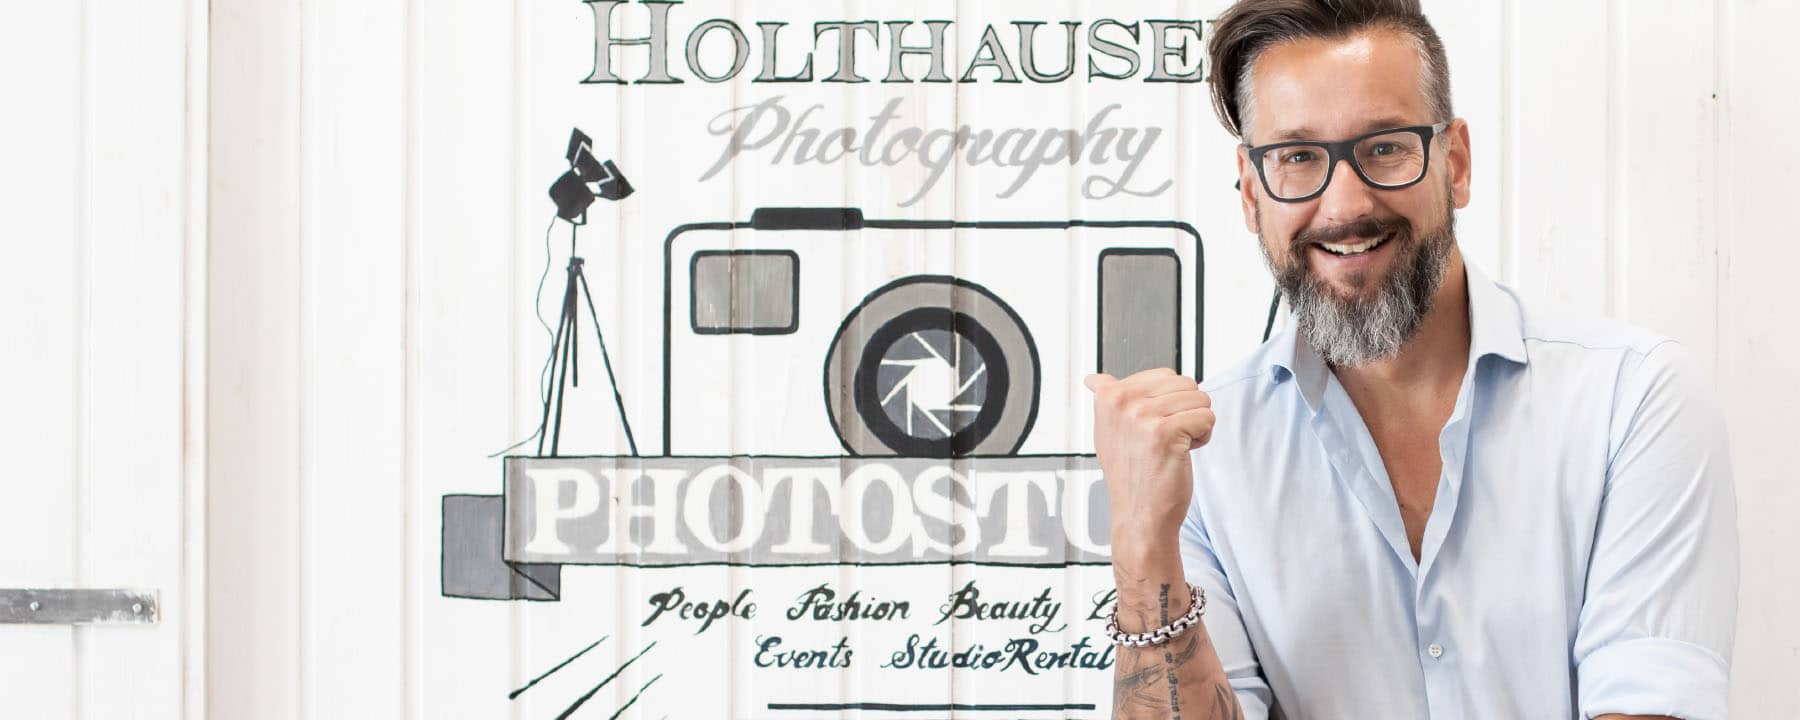 Fotograf Christian Holthausen aus Düsseldorf